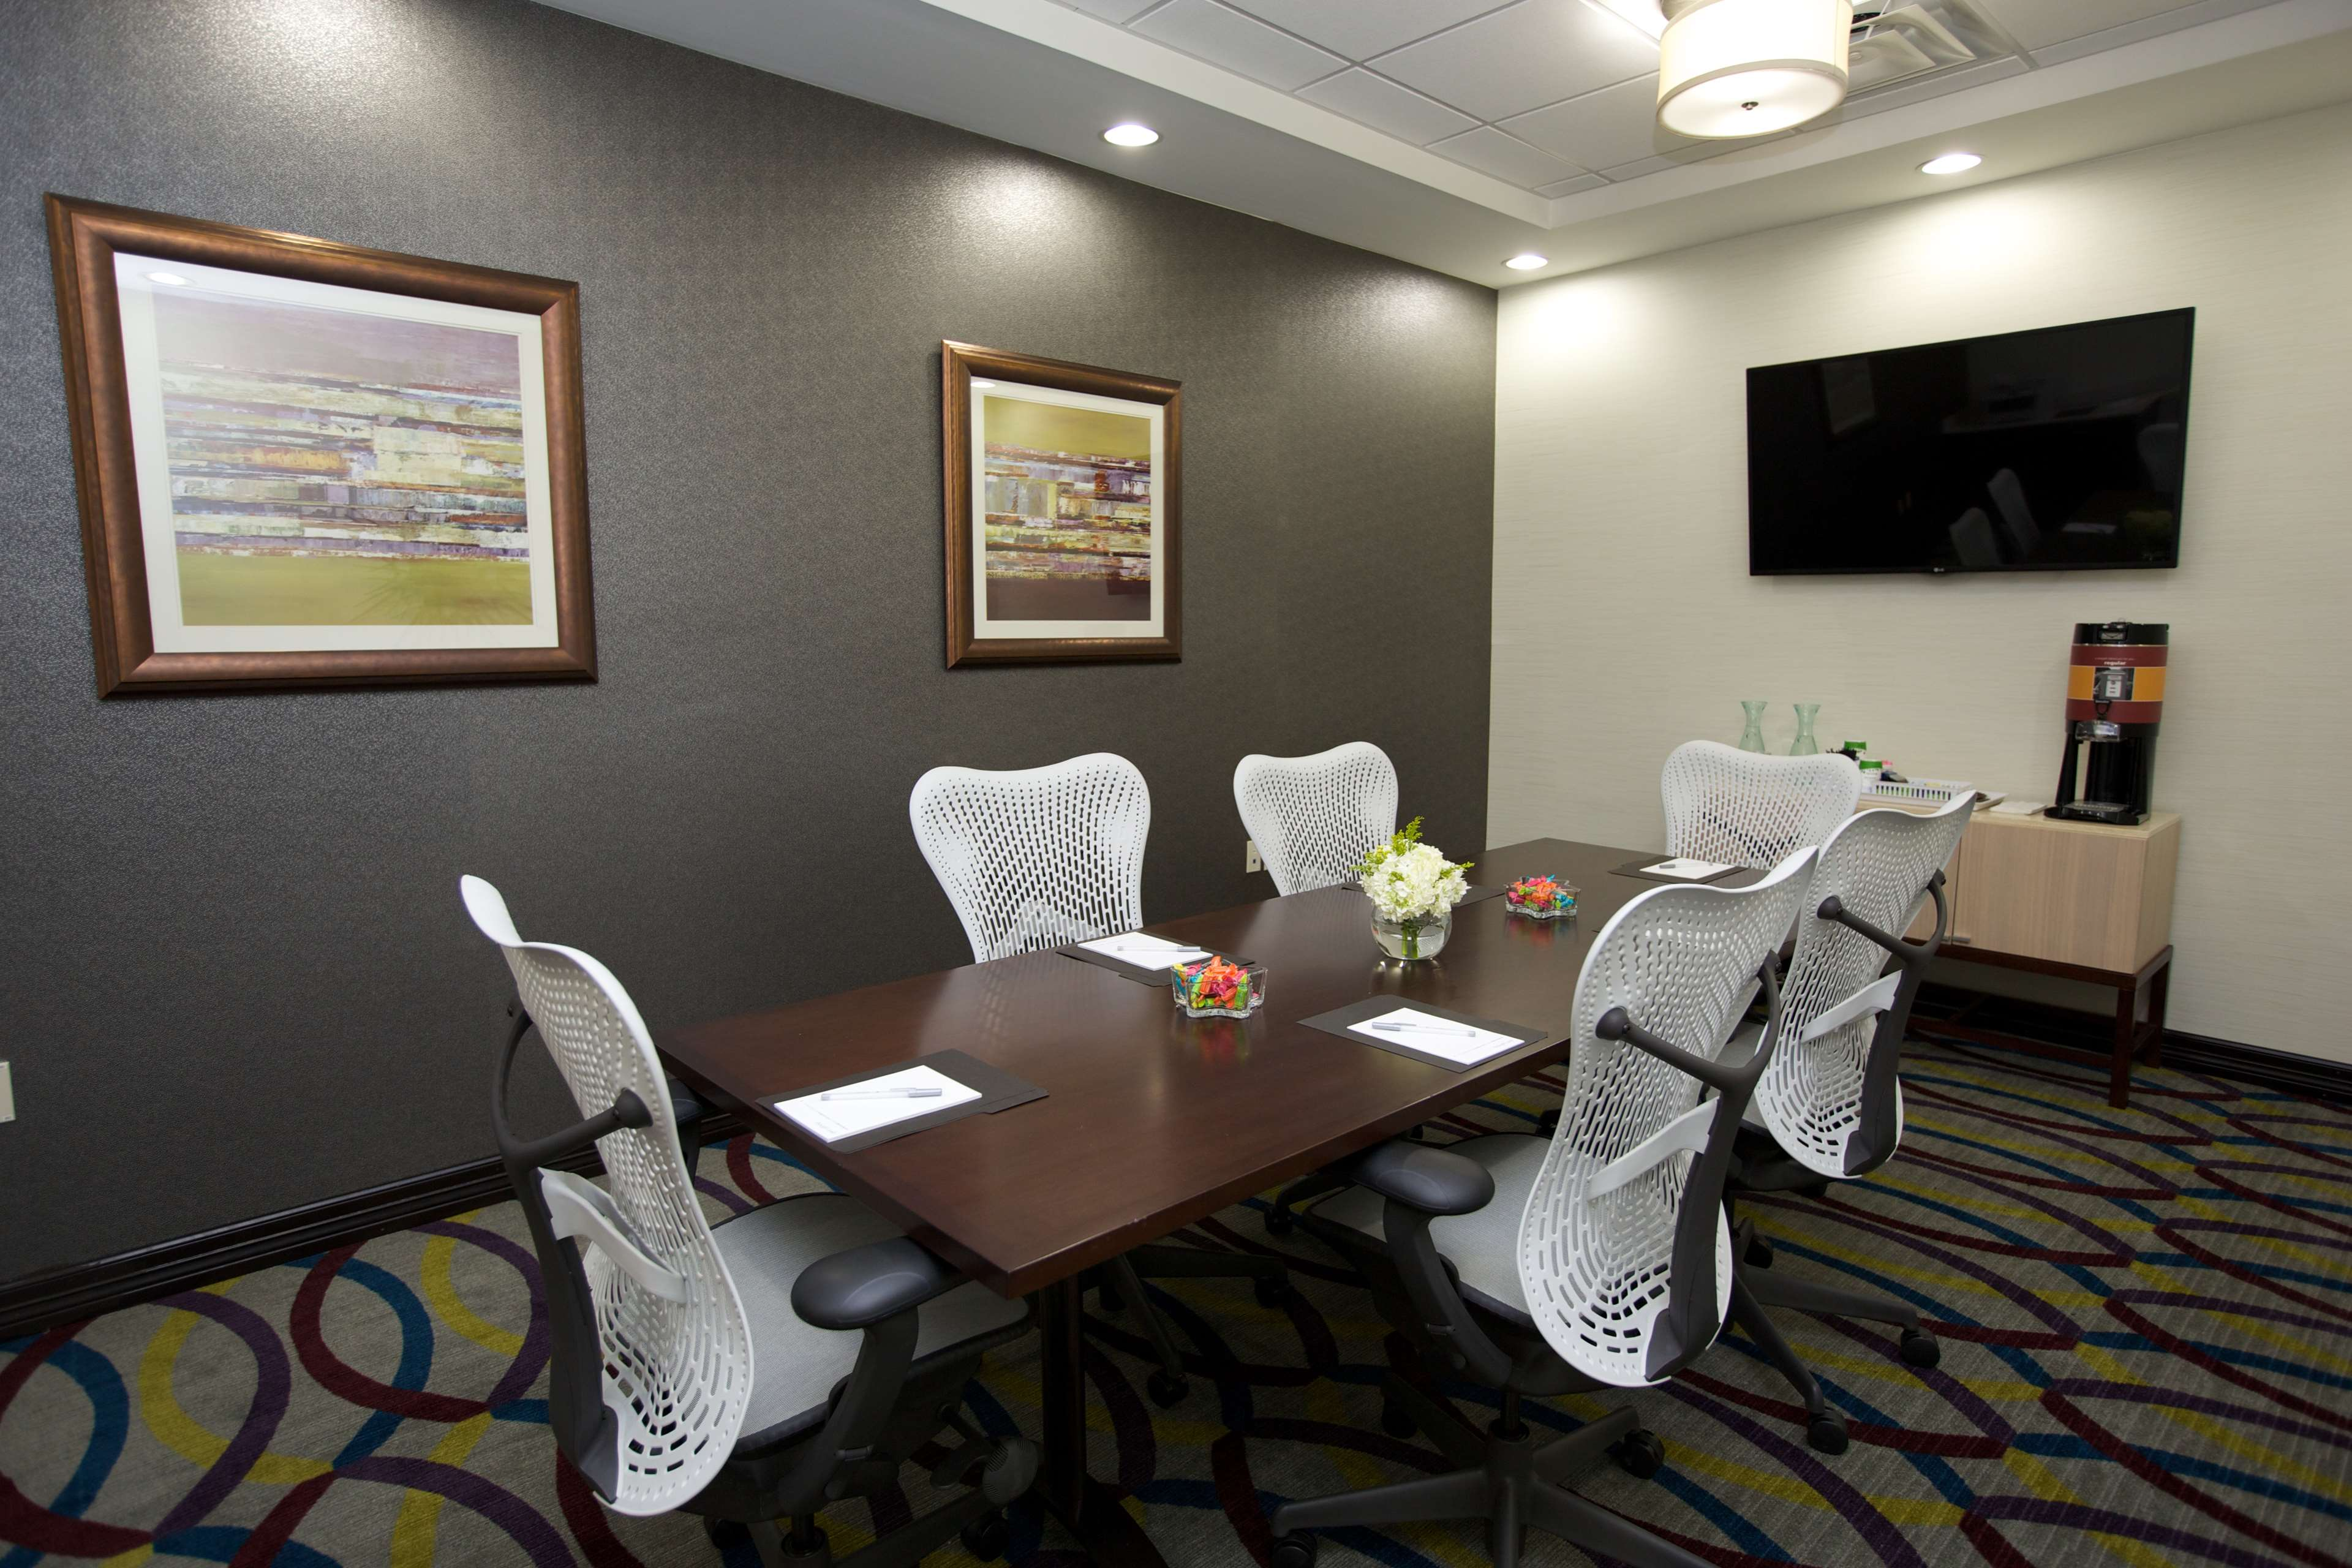 Hampton Inn & Suites Missouri City, TX image 38